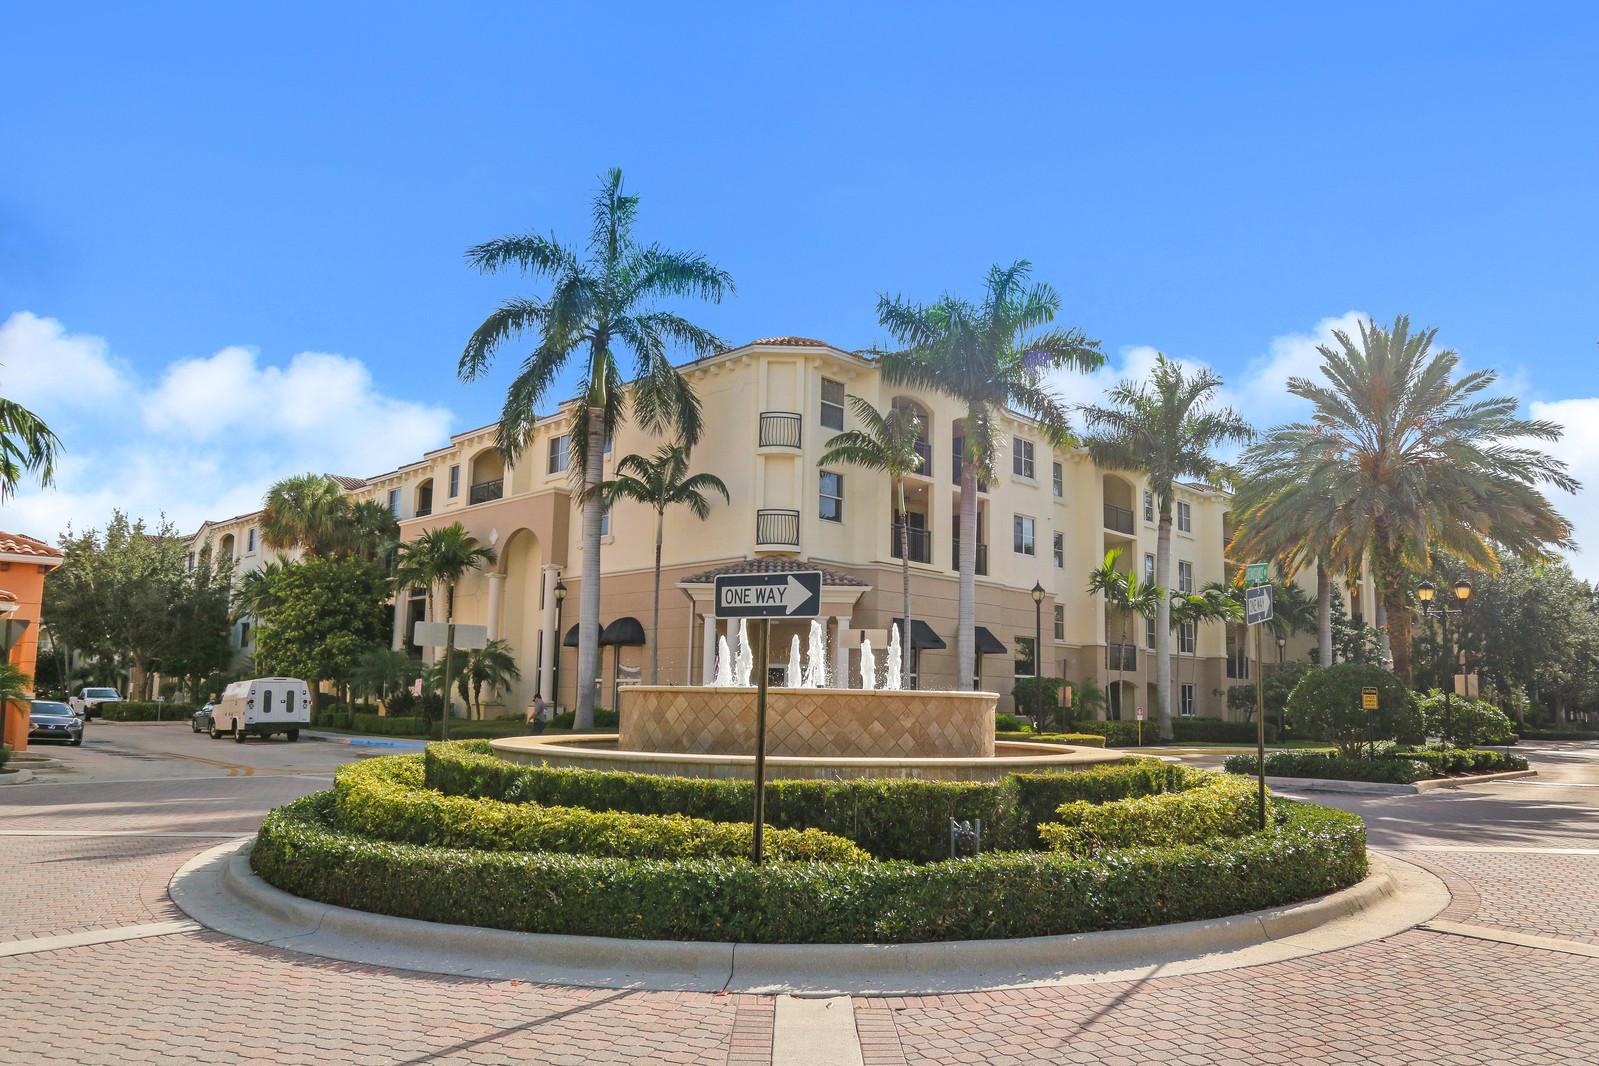 1208 Renaissance Way, Boynton Beach, FL 33426